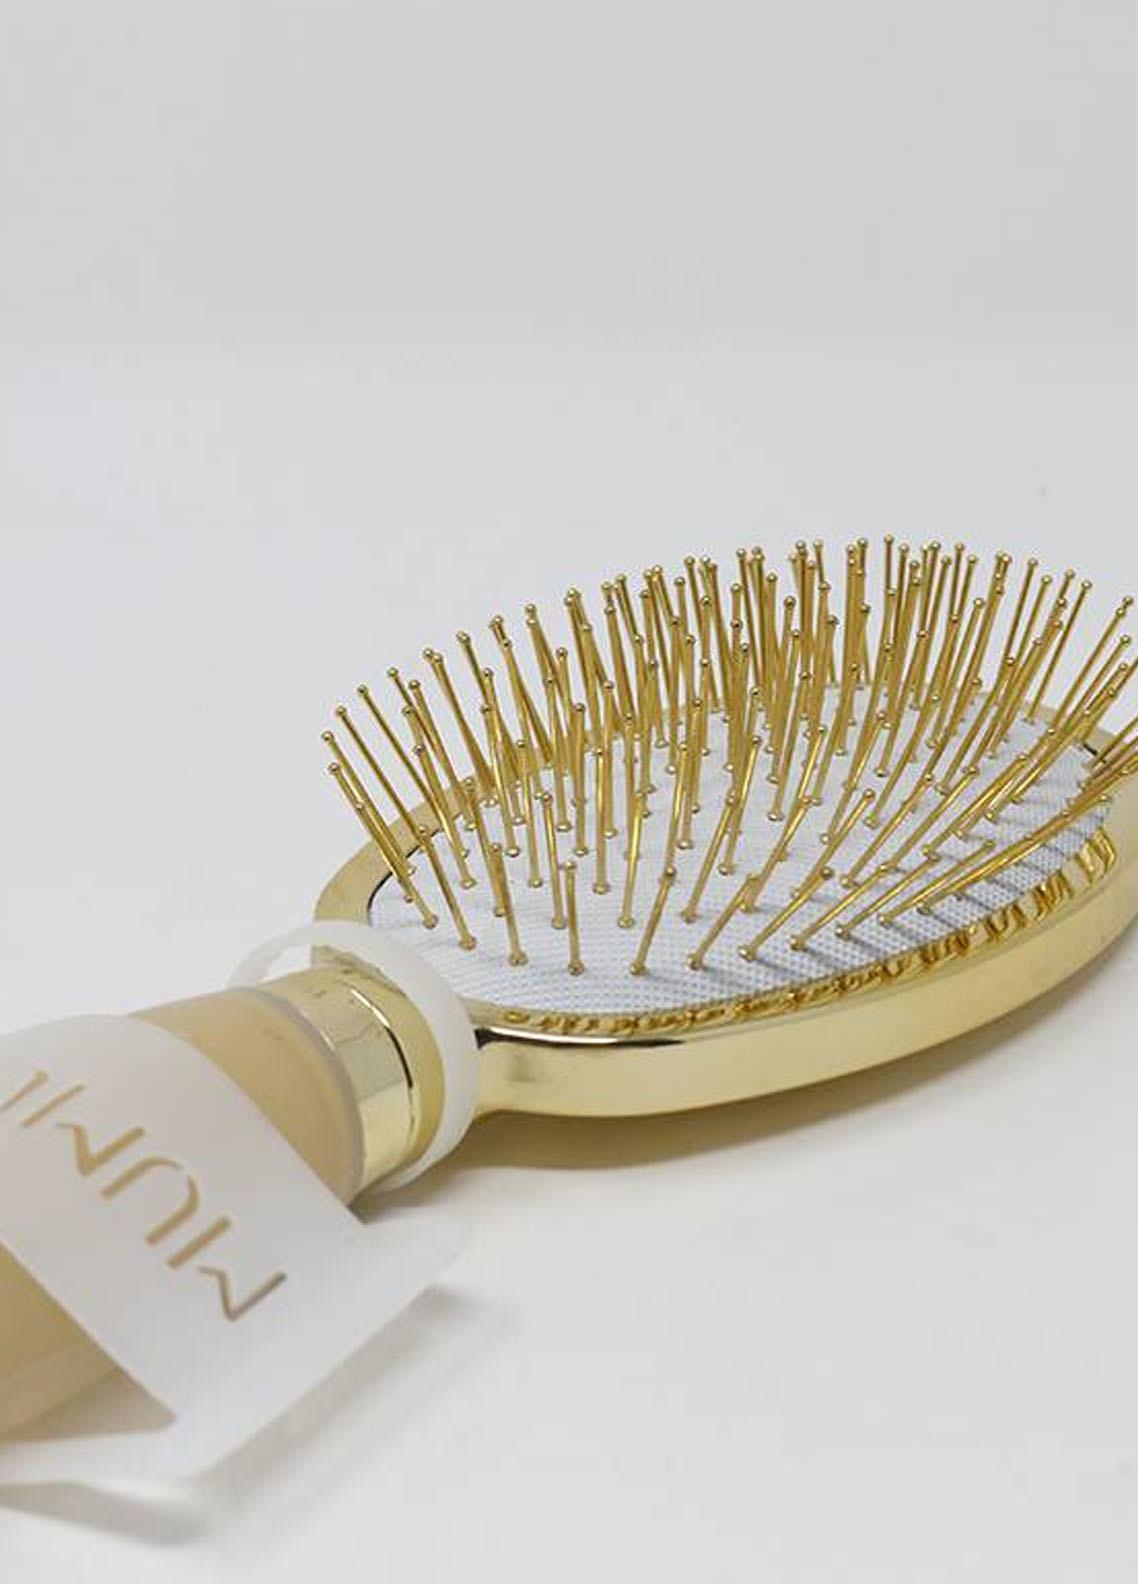 Mumuso Paddle Brush